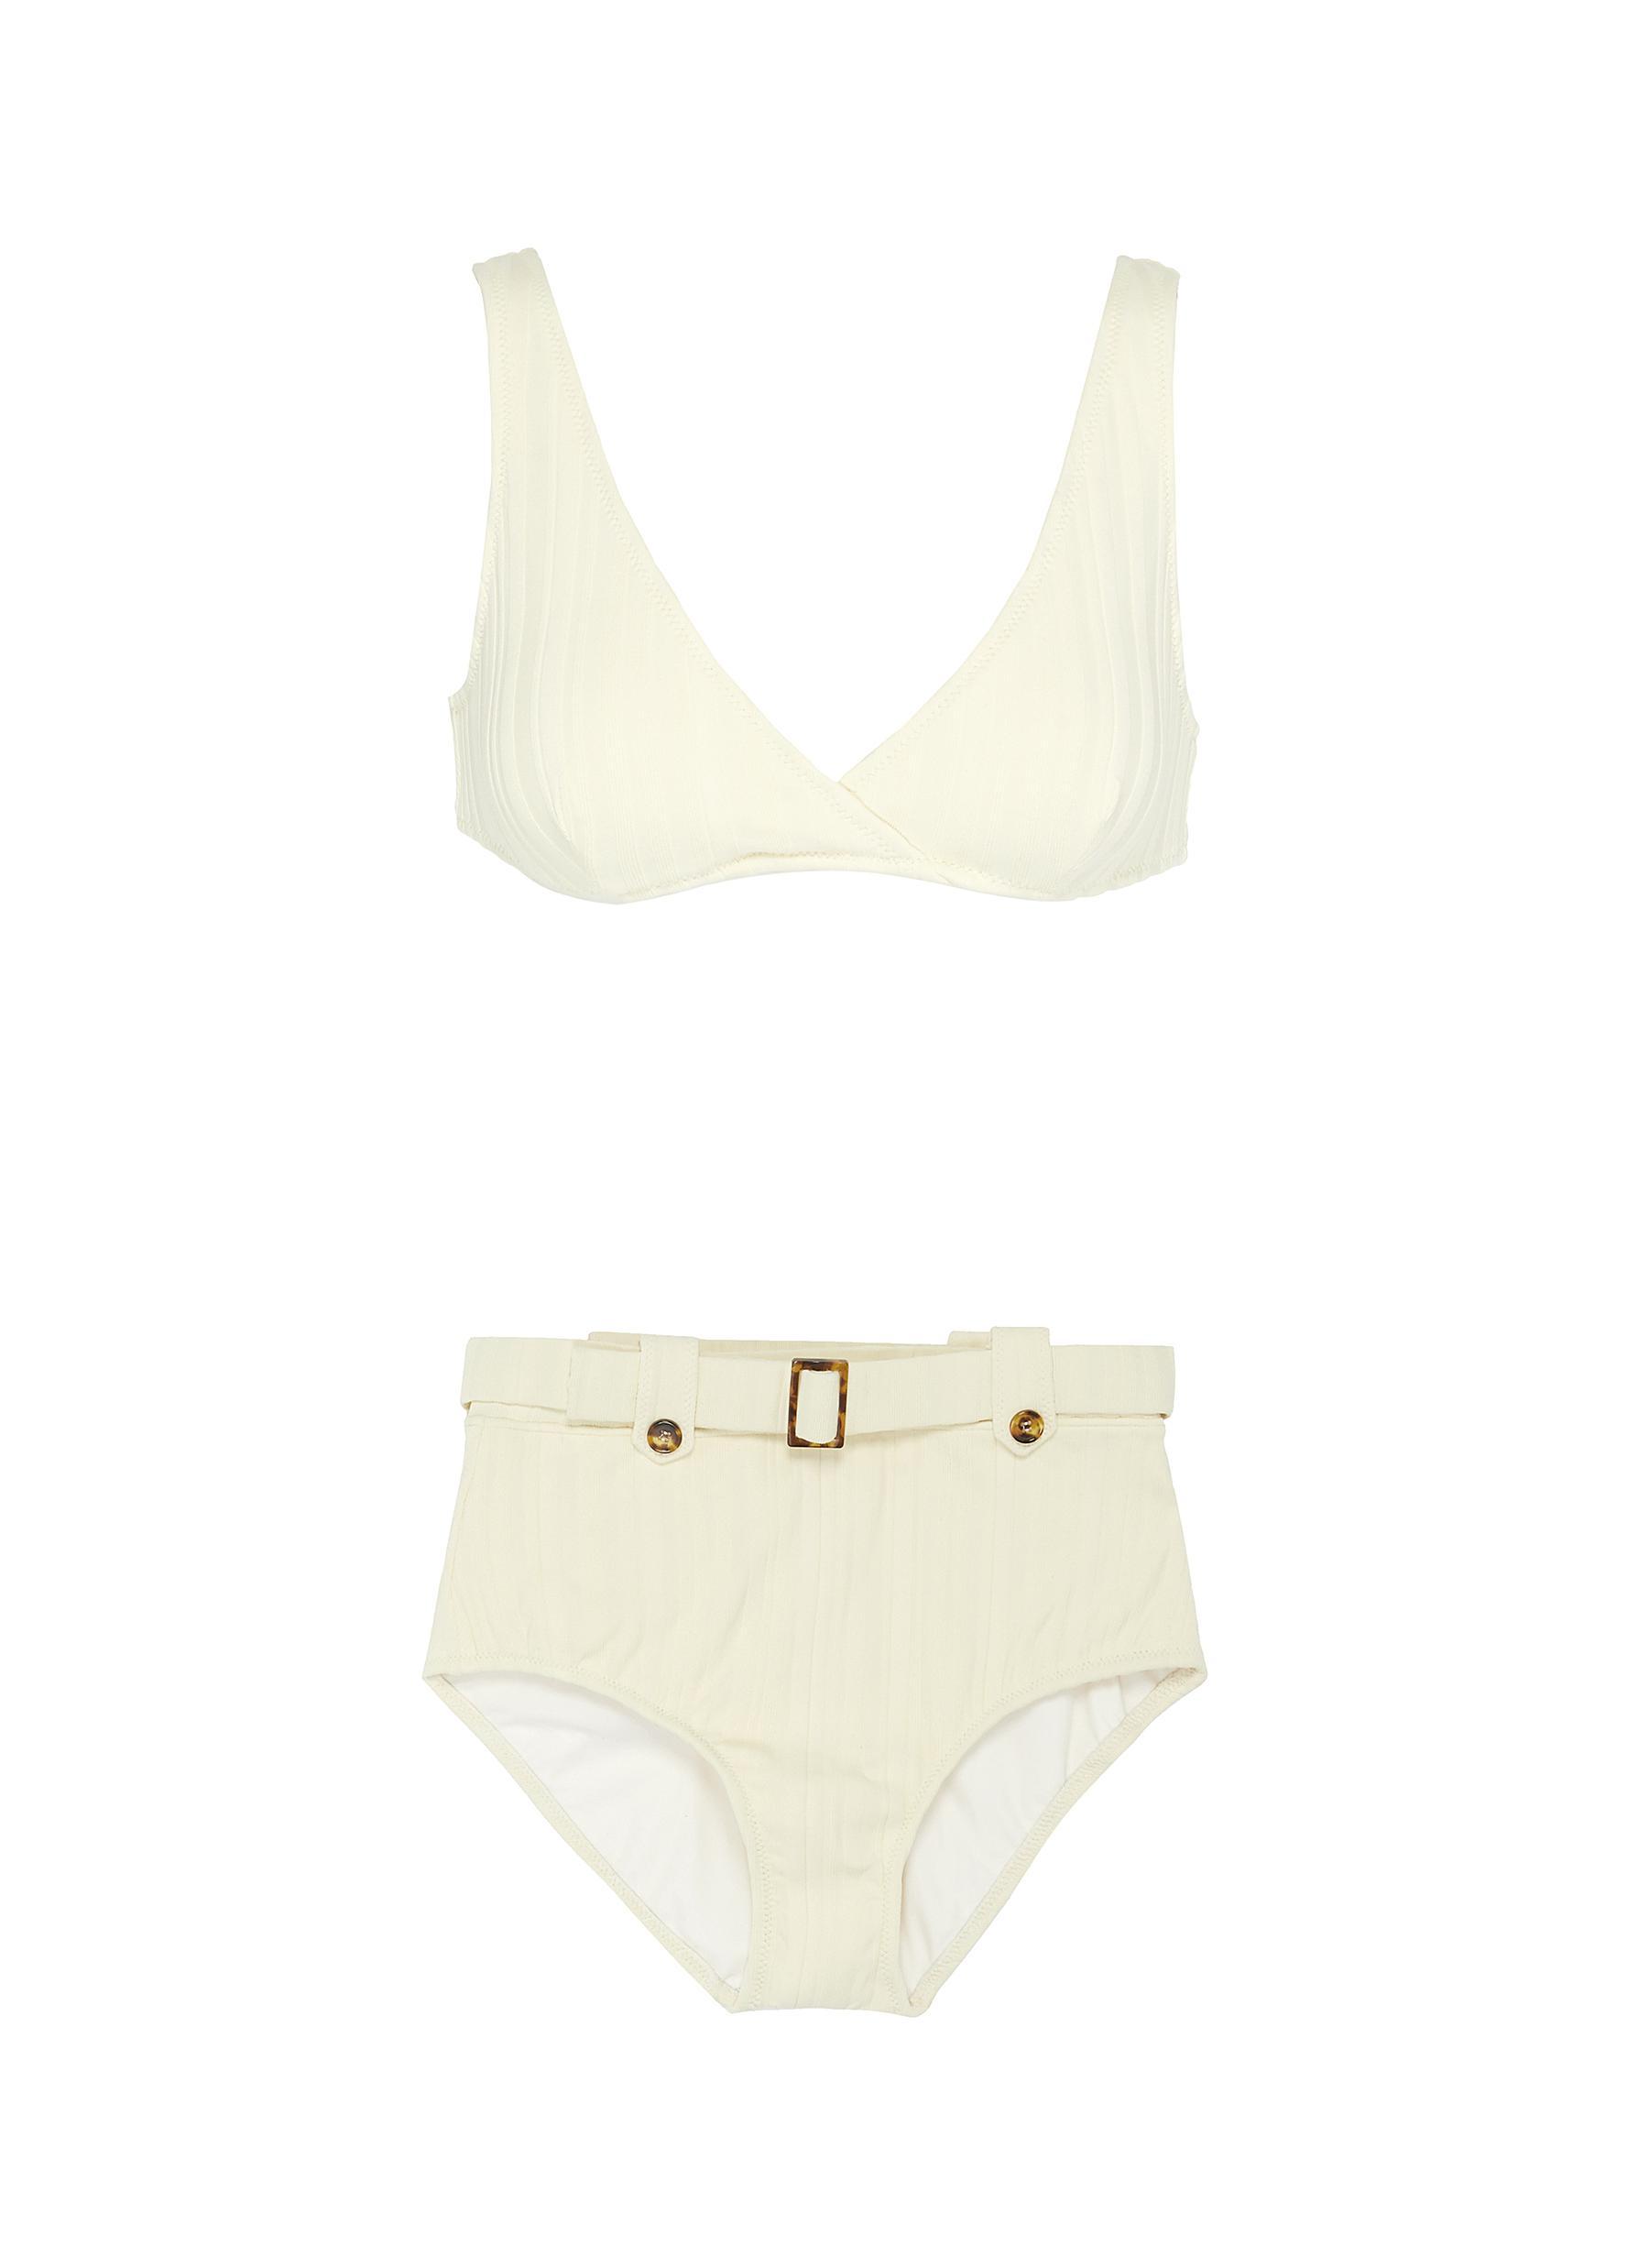 Buy Solid & Striped Swimwear 'The Annie' ribbed bikini top